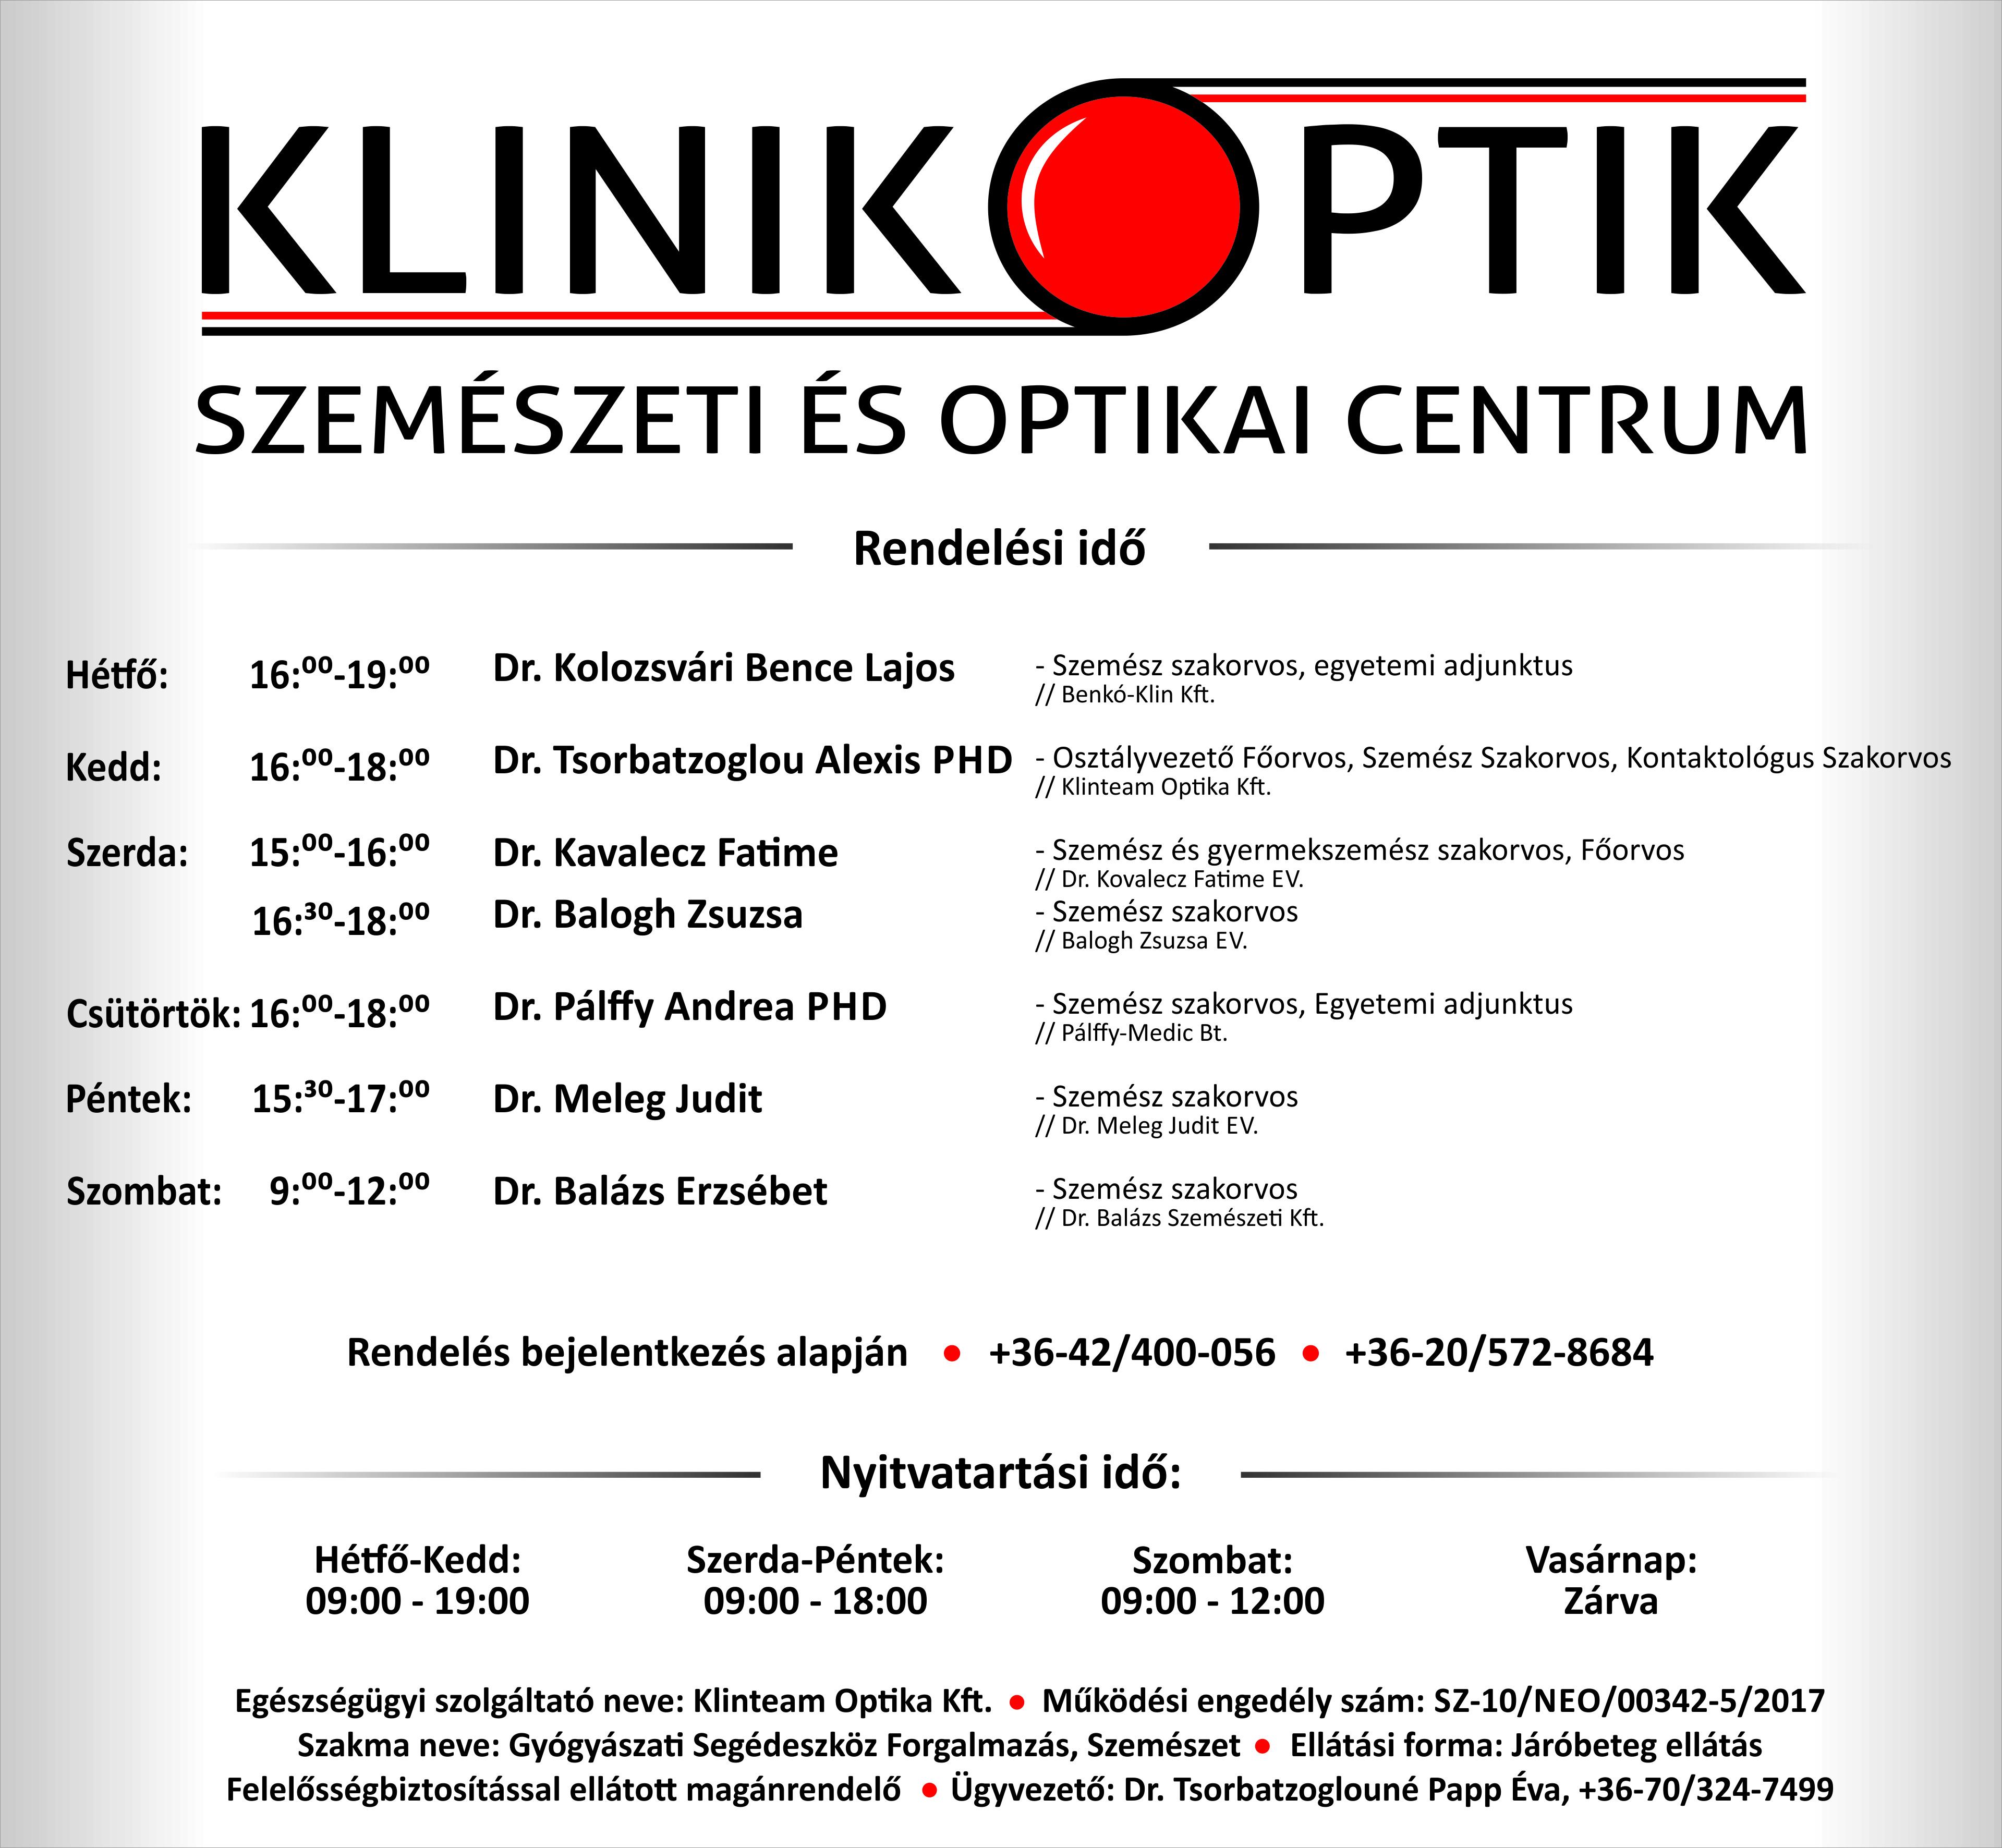 Nyomtatas OPTIKA Ontapados Laminalt 65x60cm. thumbnail klinikoptik idol 60dea3b8f9